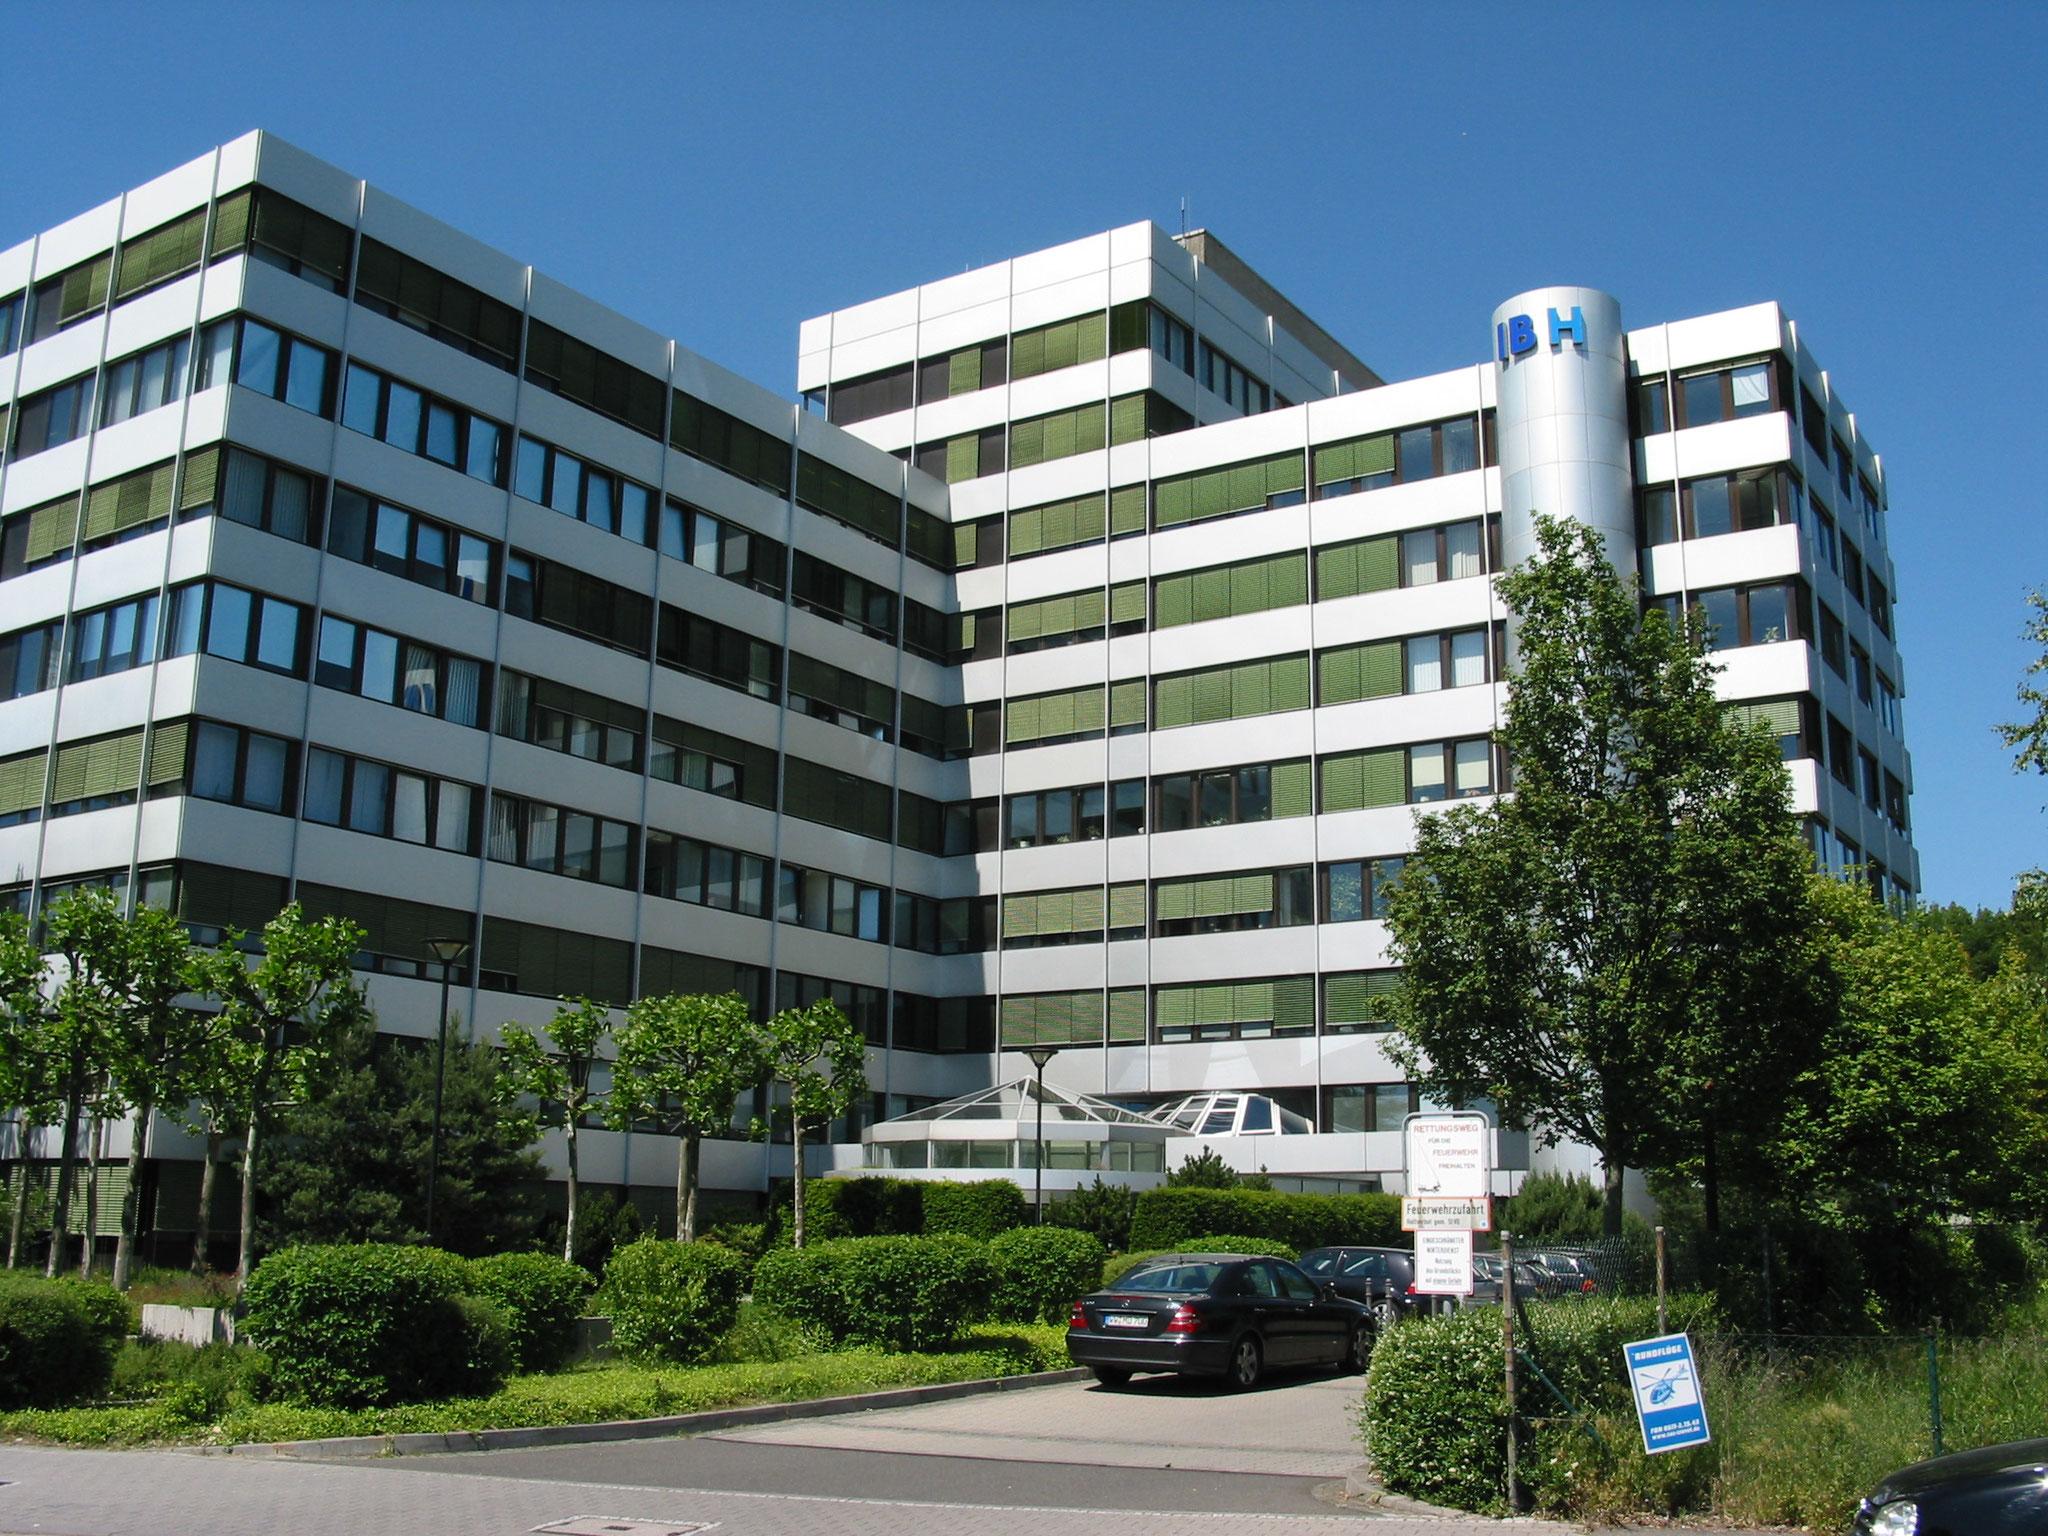 Hessisches Baumanagement; HI-Zentrale Wiesbaden